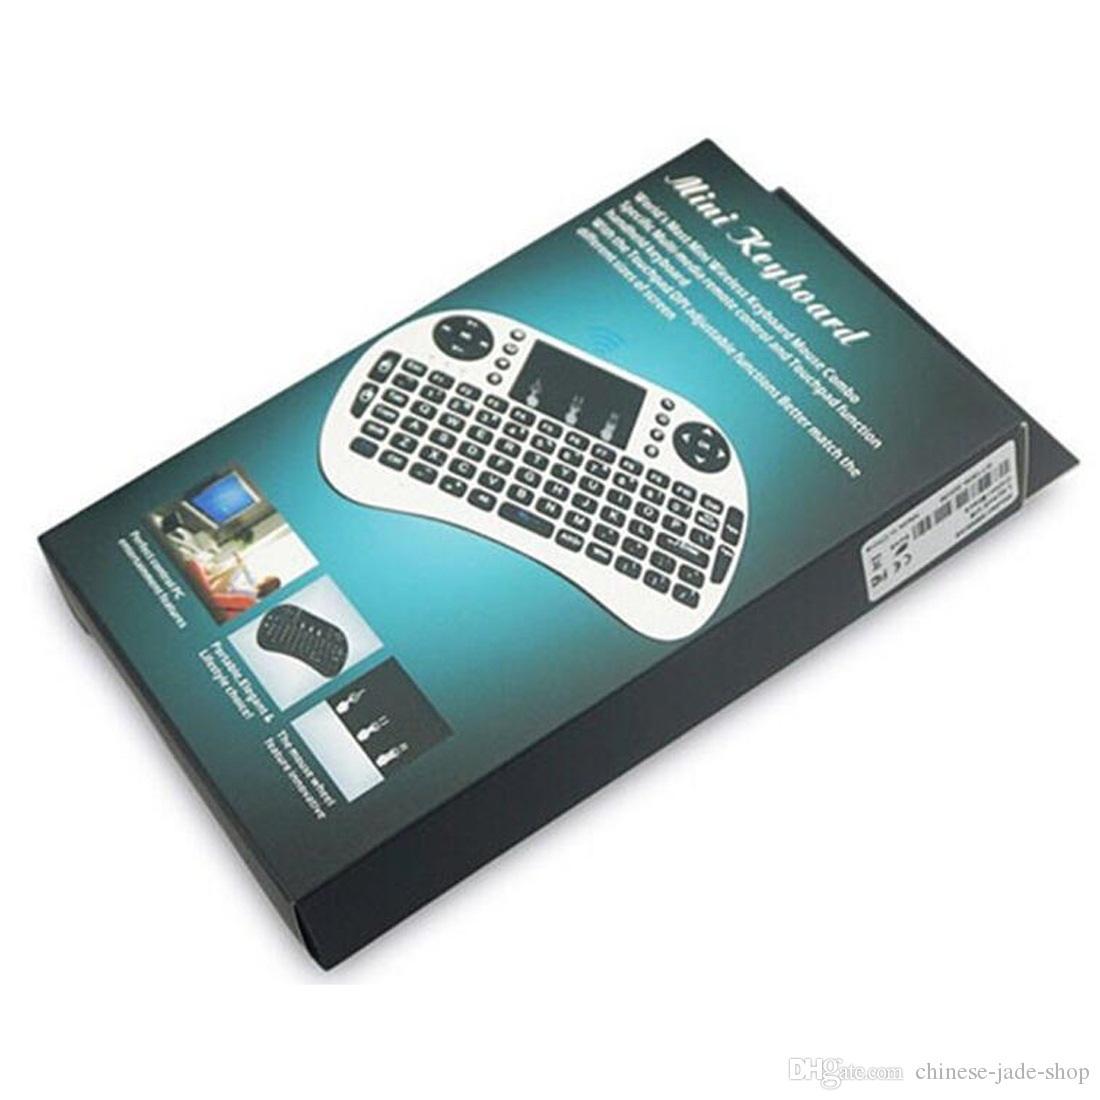 Mini RII I8 Teclado inalámbrico 2.4G Mouse de aire Mouse Remoto Control TouchPAD Retroiluminación Retroceso para Smart Android TV Caja Tablet PC Inglés